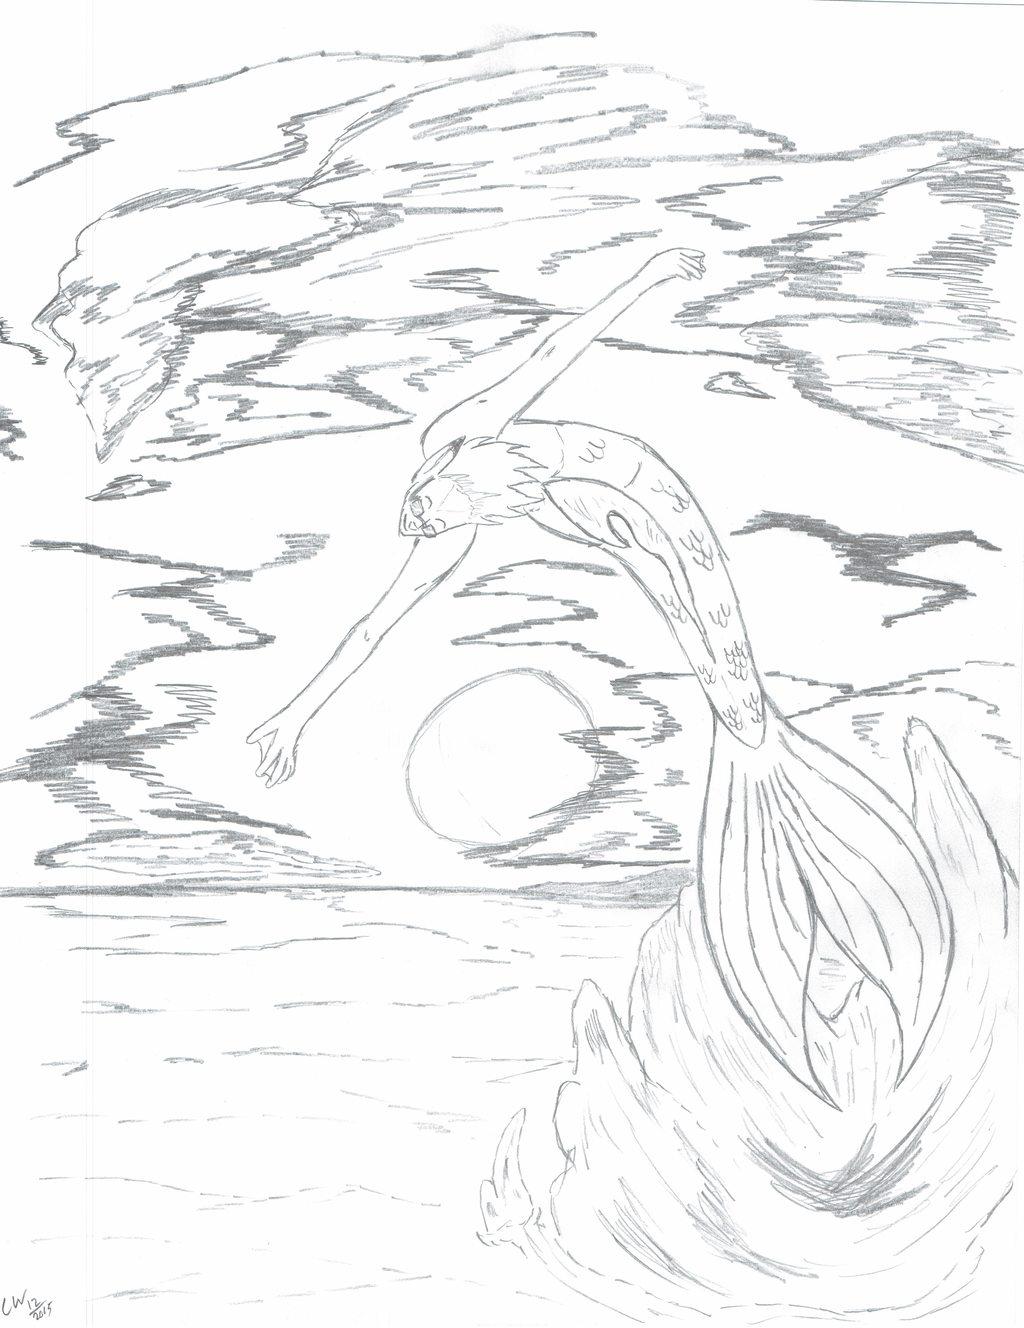 Most recent image: Wavebreacher (Sketch)